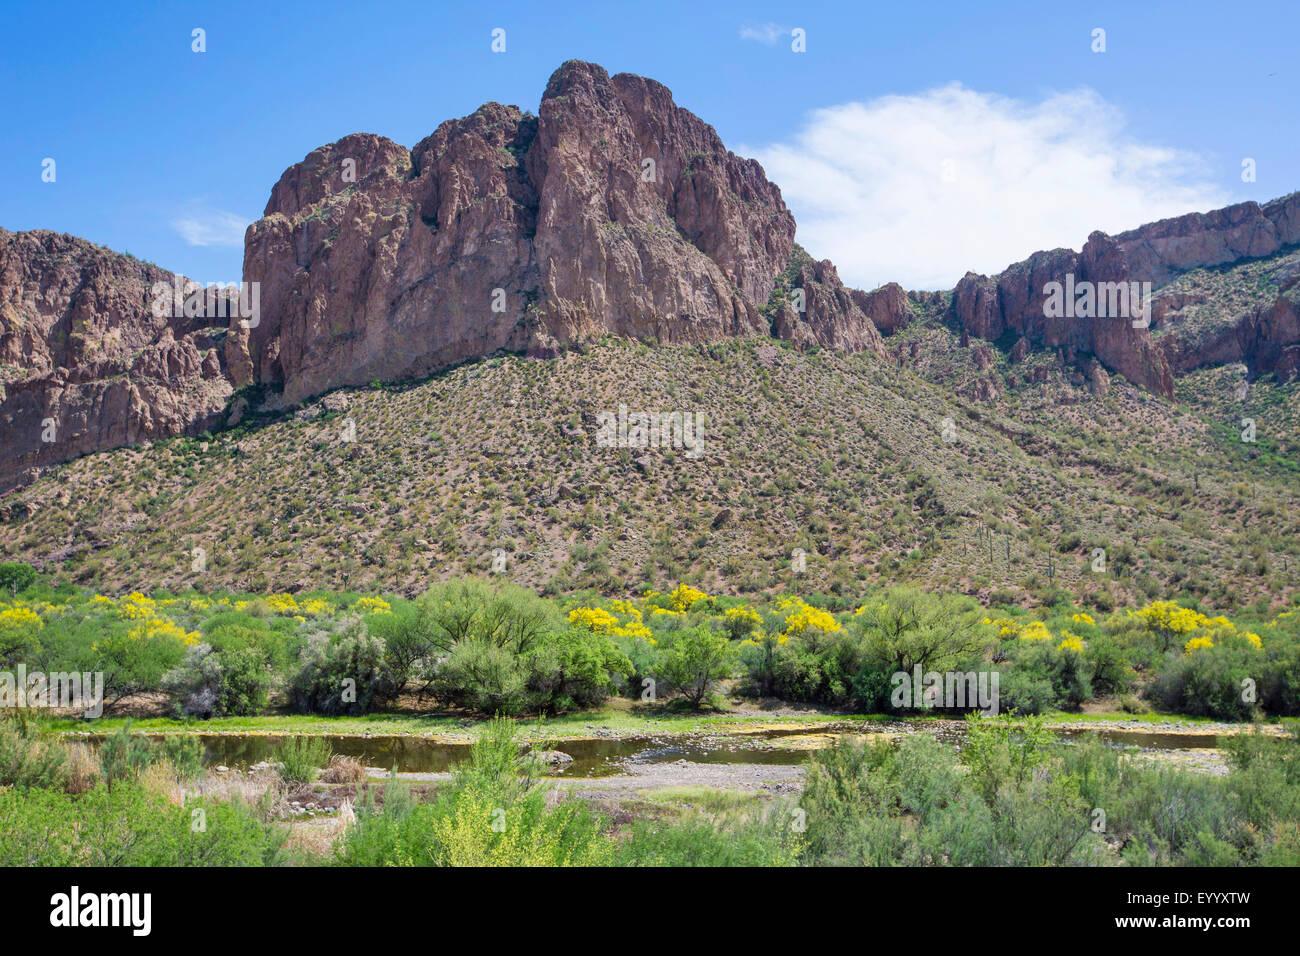 Blaue Palo Verde (Parkinsonia Florida), Salt River mit blühenden Parkinsonia Florida am Ufer, USA, Arizona, Stockbild